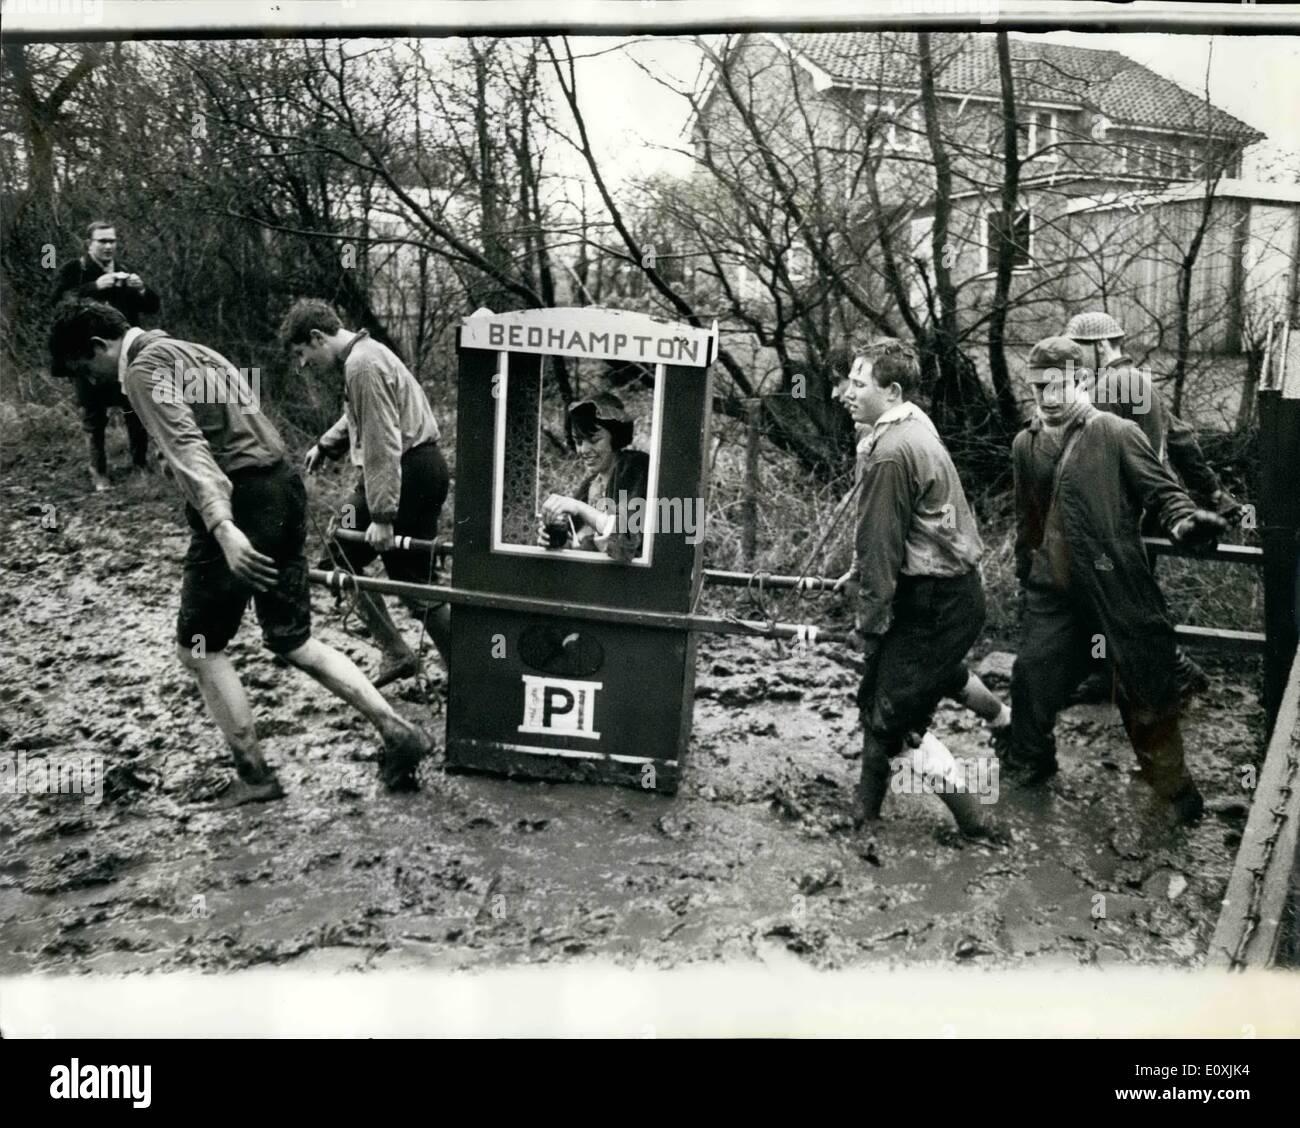 Feb. 20, 1967 - ress Photo - Stock Image